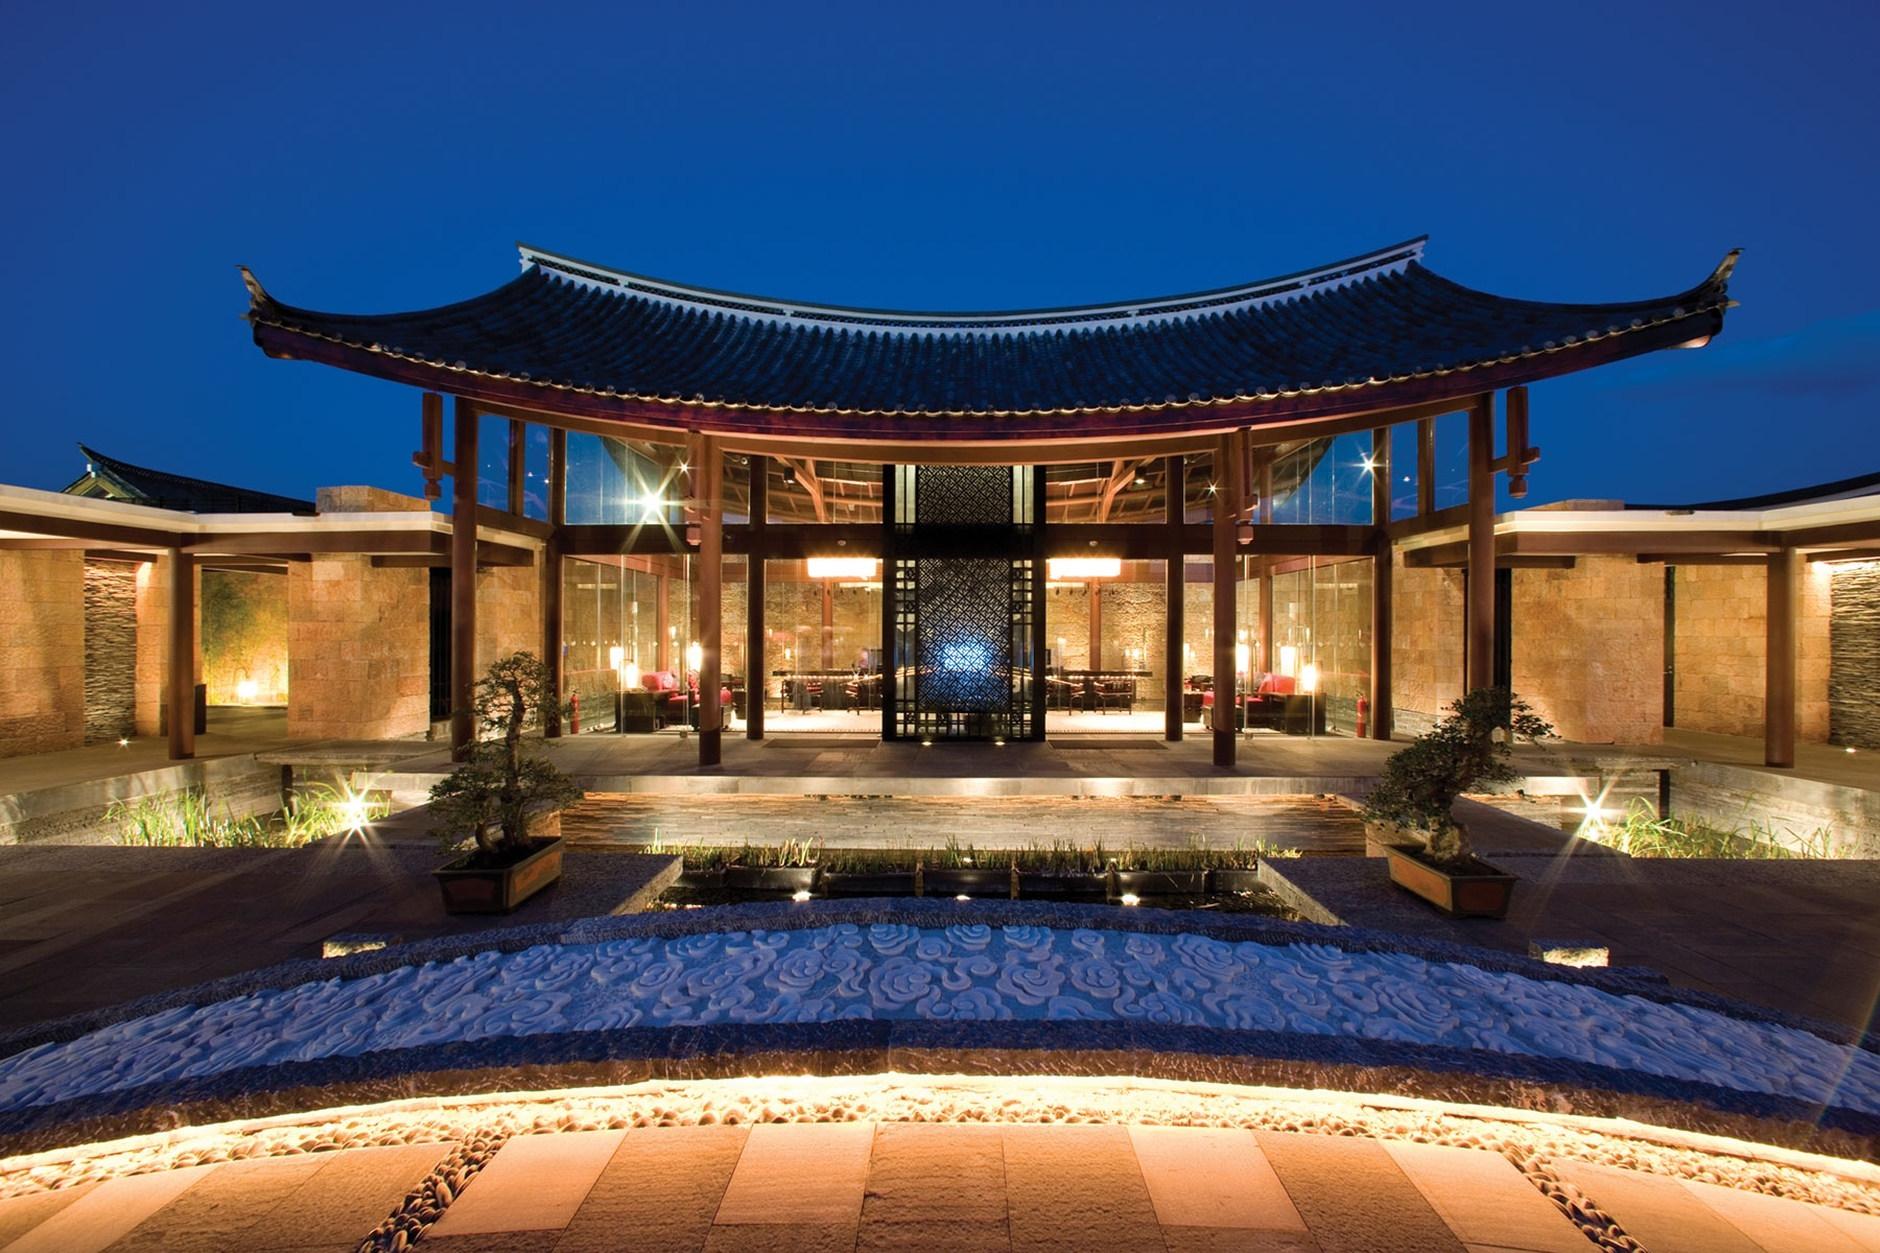 Banyan tree lijiang resort china karmatrendz for Modern home decor from china